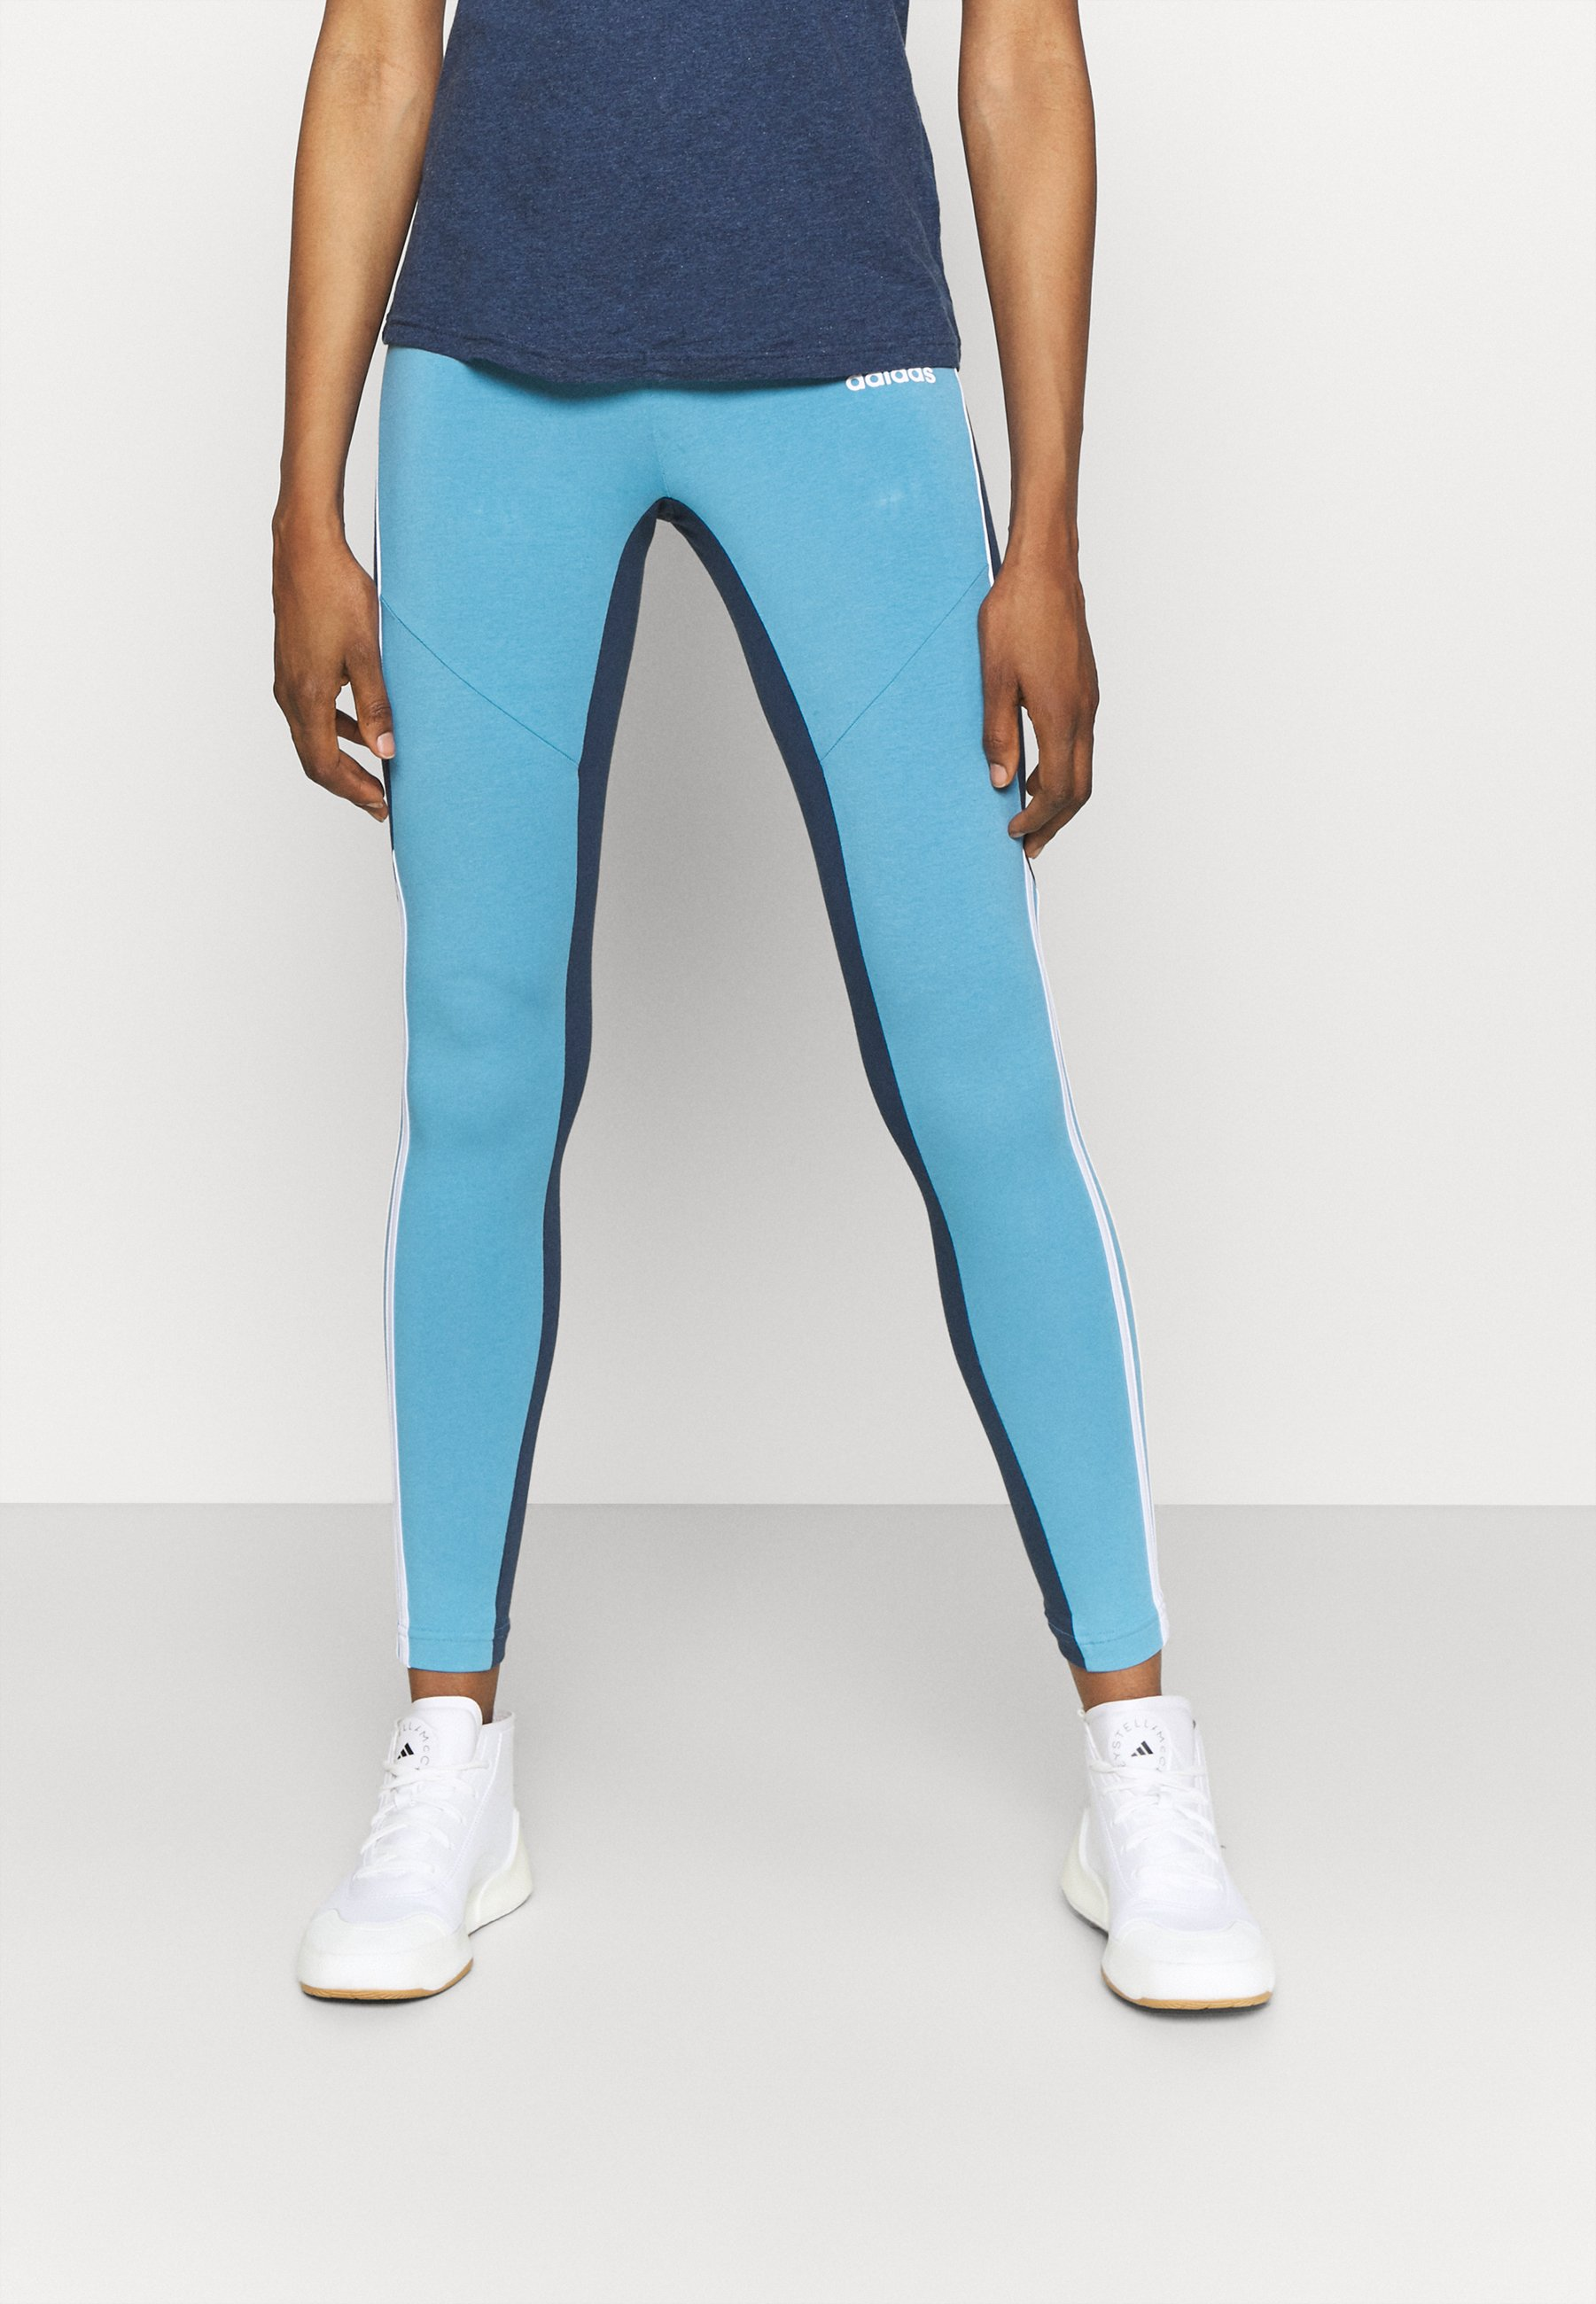 Femme ADIDAS SPORTSWEAR COLORBLOCK LEGGINGS - Collants